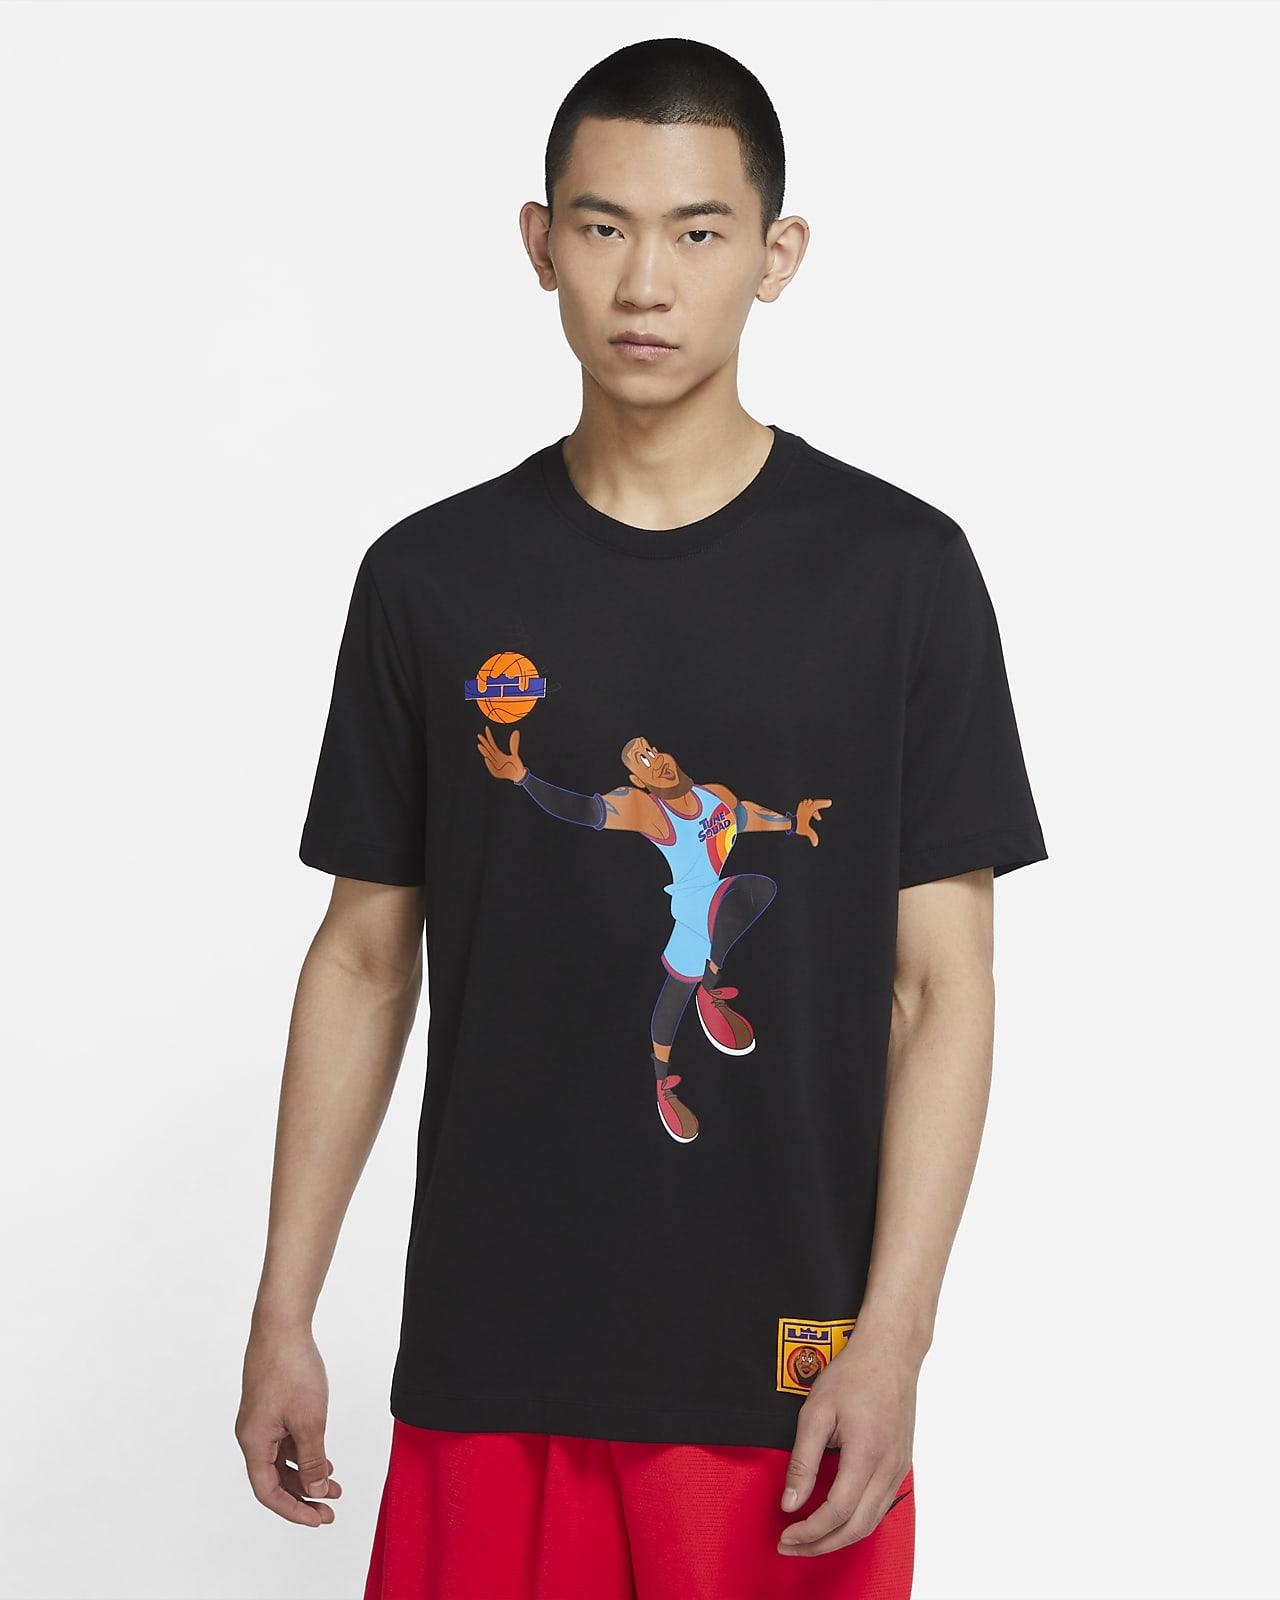 LeBron x Space Jam: A New Legacy Men's Nike Dri-FIT Basketball T-Shirt